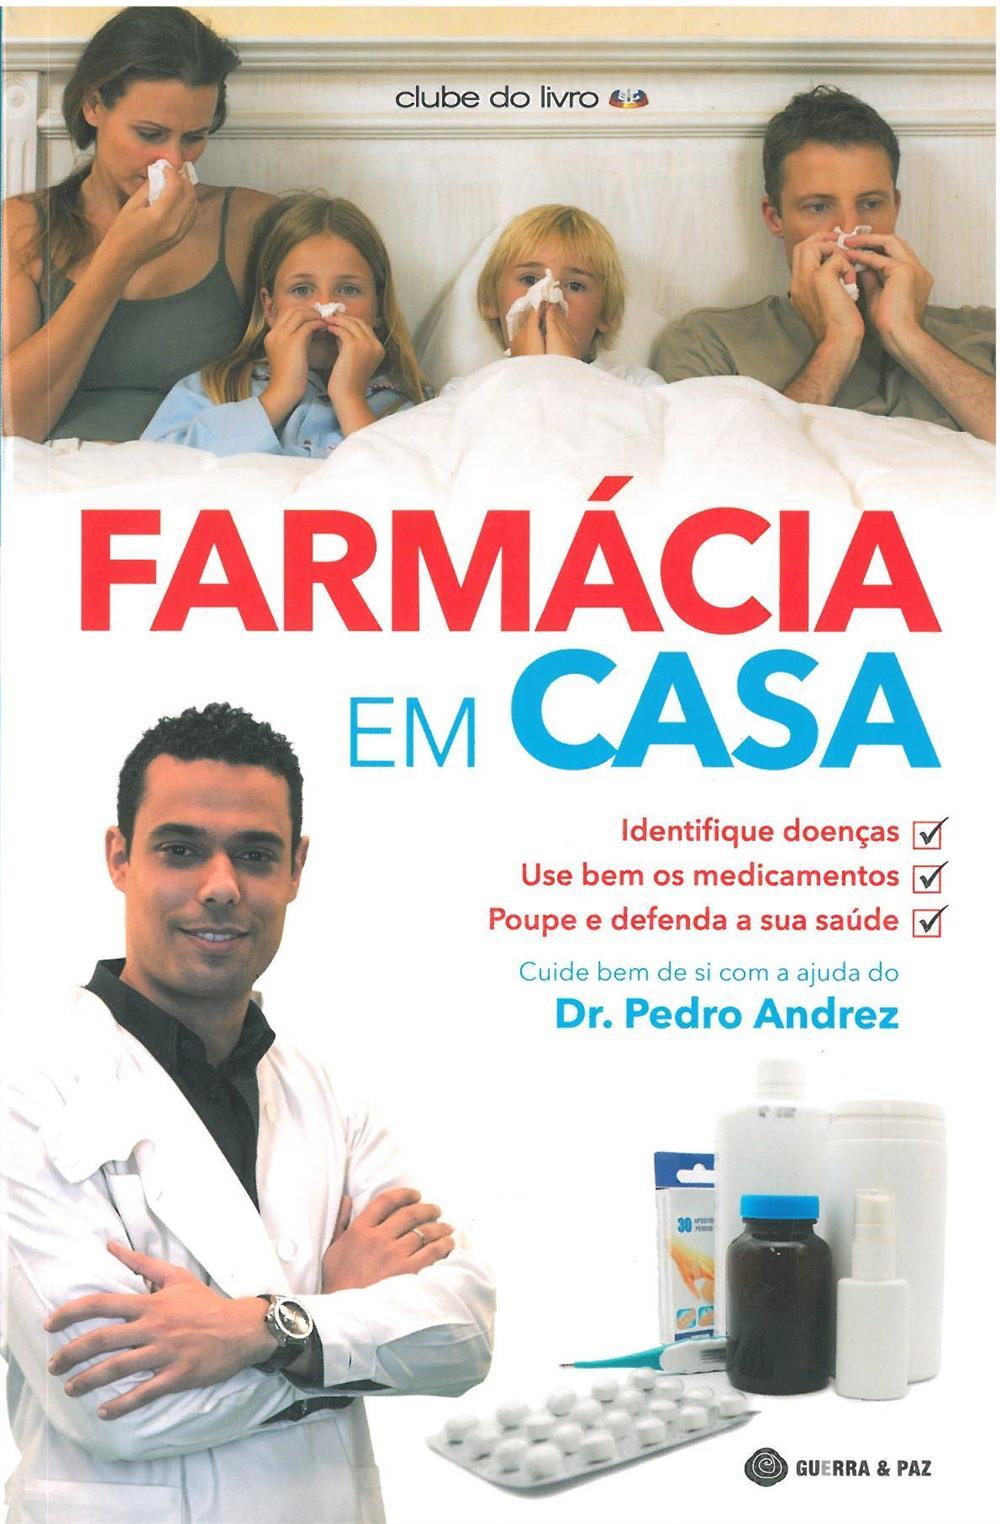 Farmácia em casa_.jpg